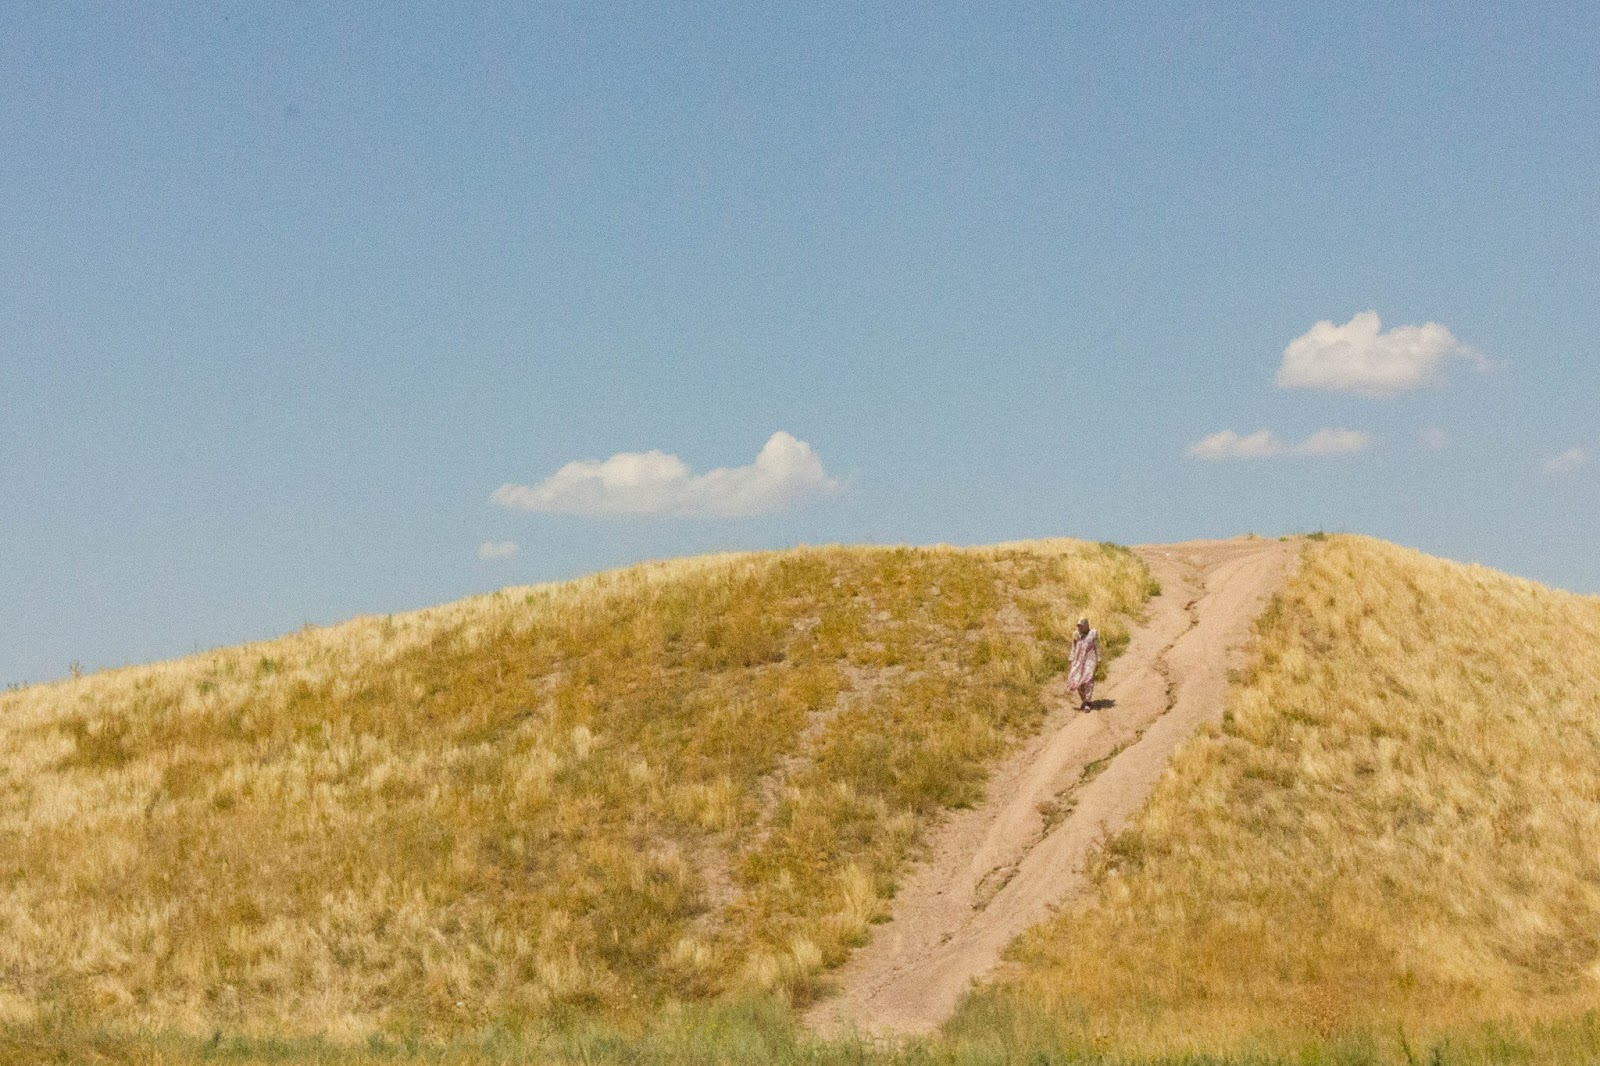 Кыргызстан, Бурана, девушка спускается с горы